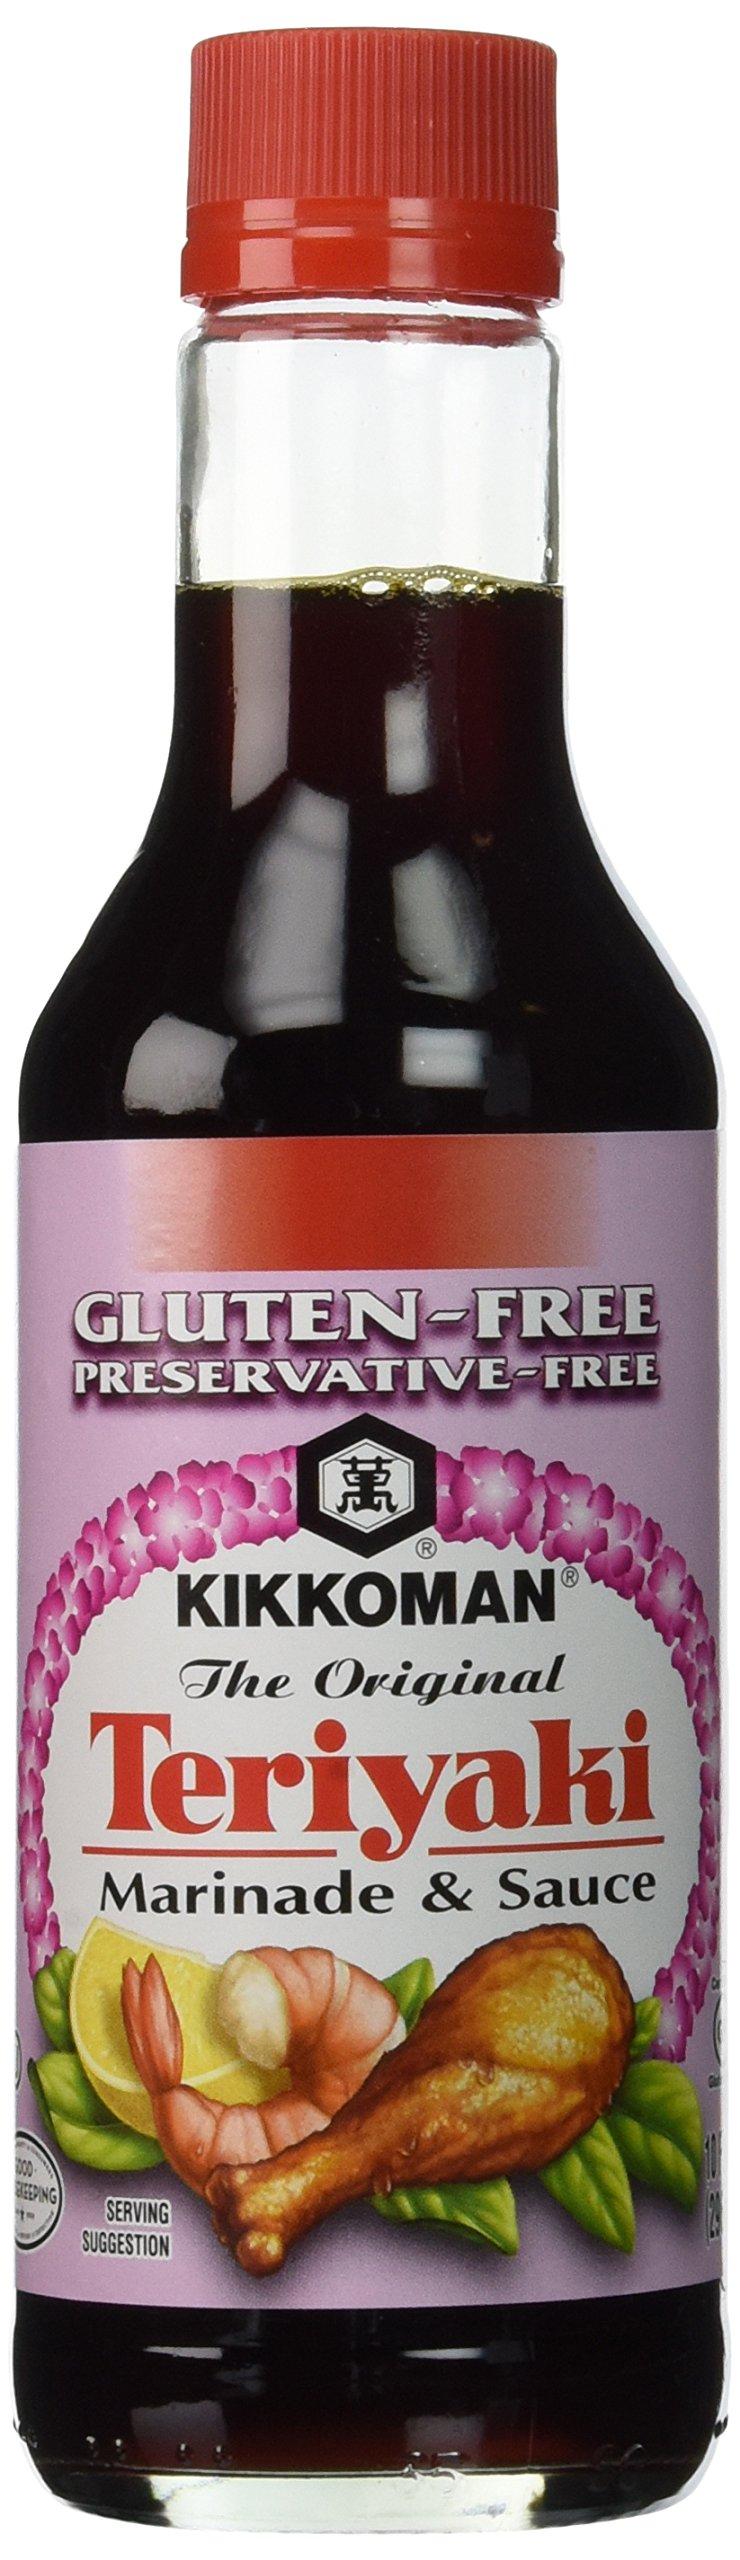 Kikkoman Gluten Free Teriyaki Sauce, 10 Ounce, one pack